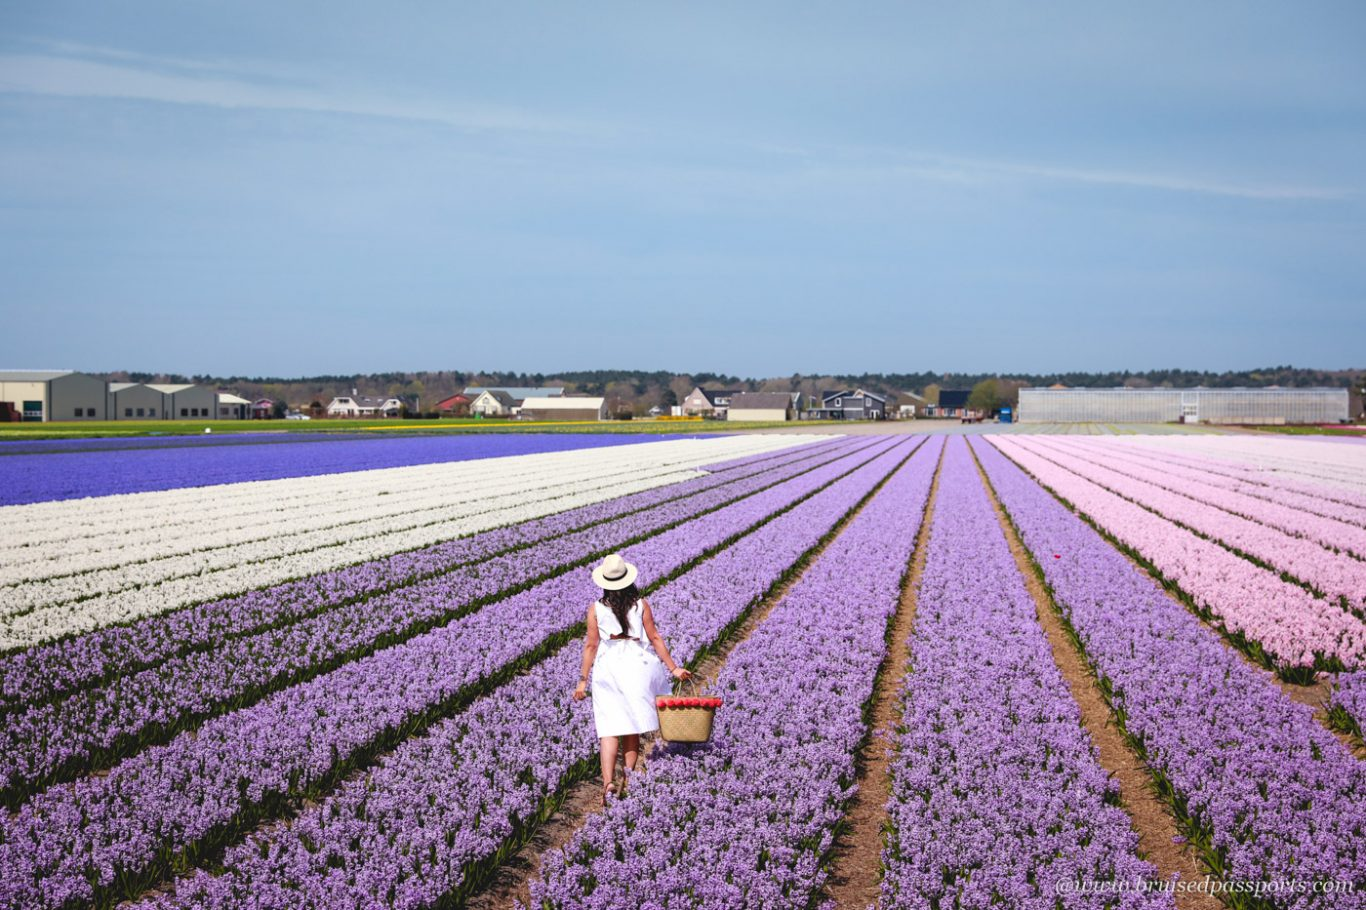 Tulip fields near The Hague